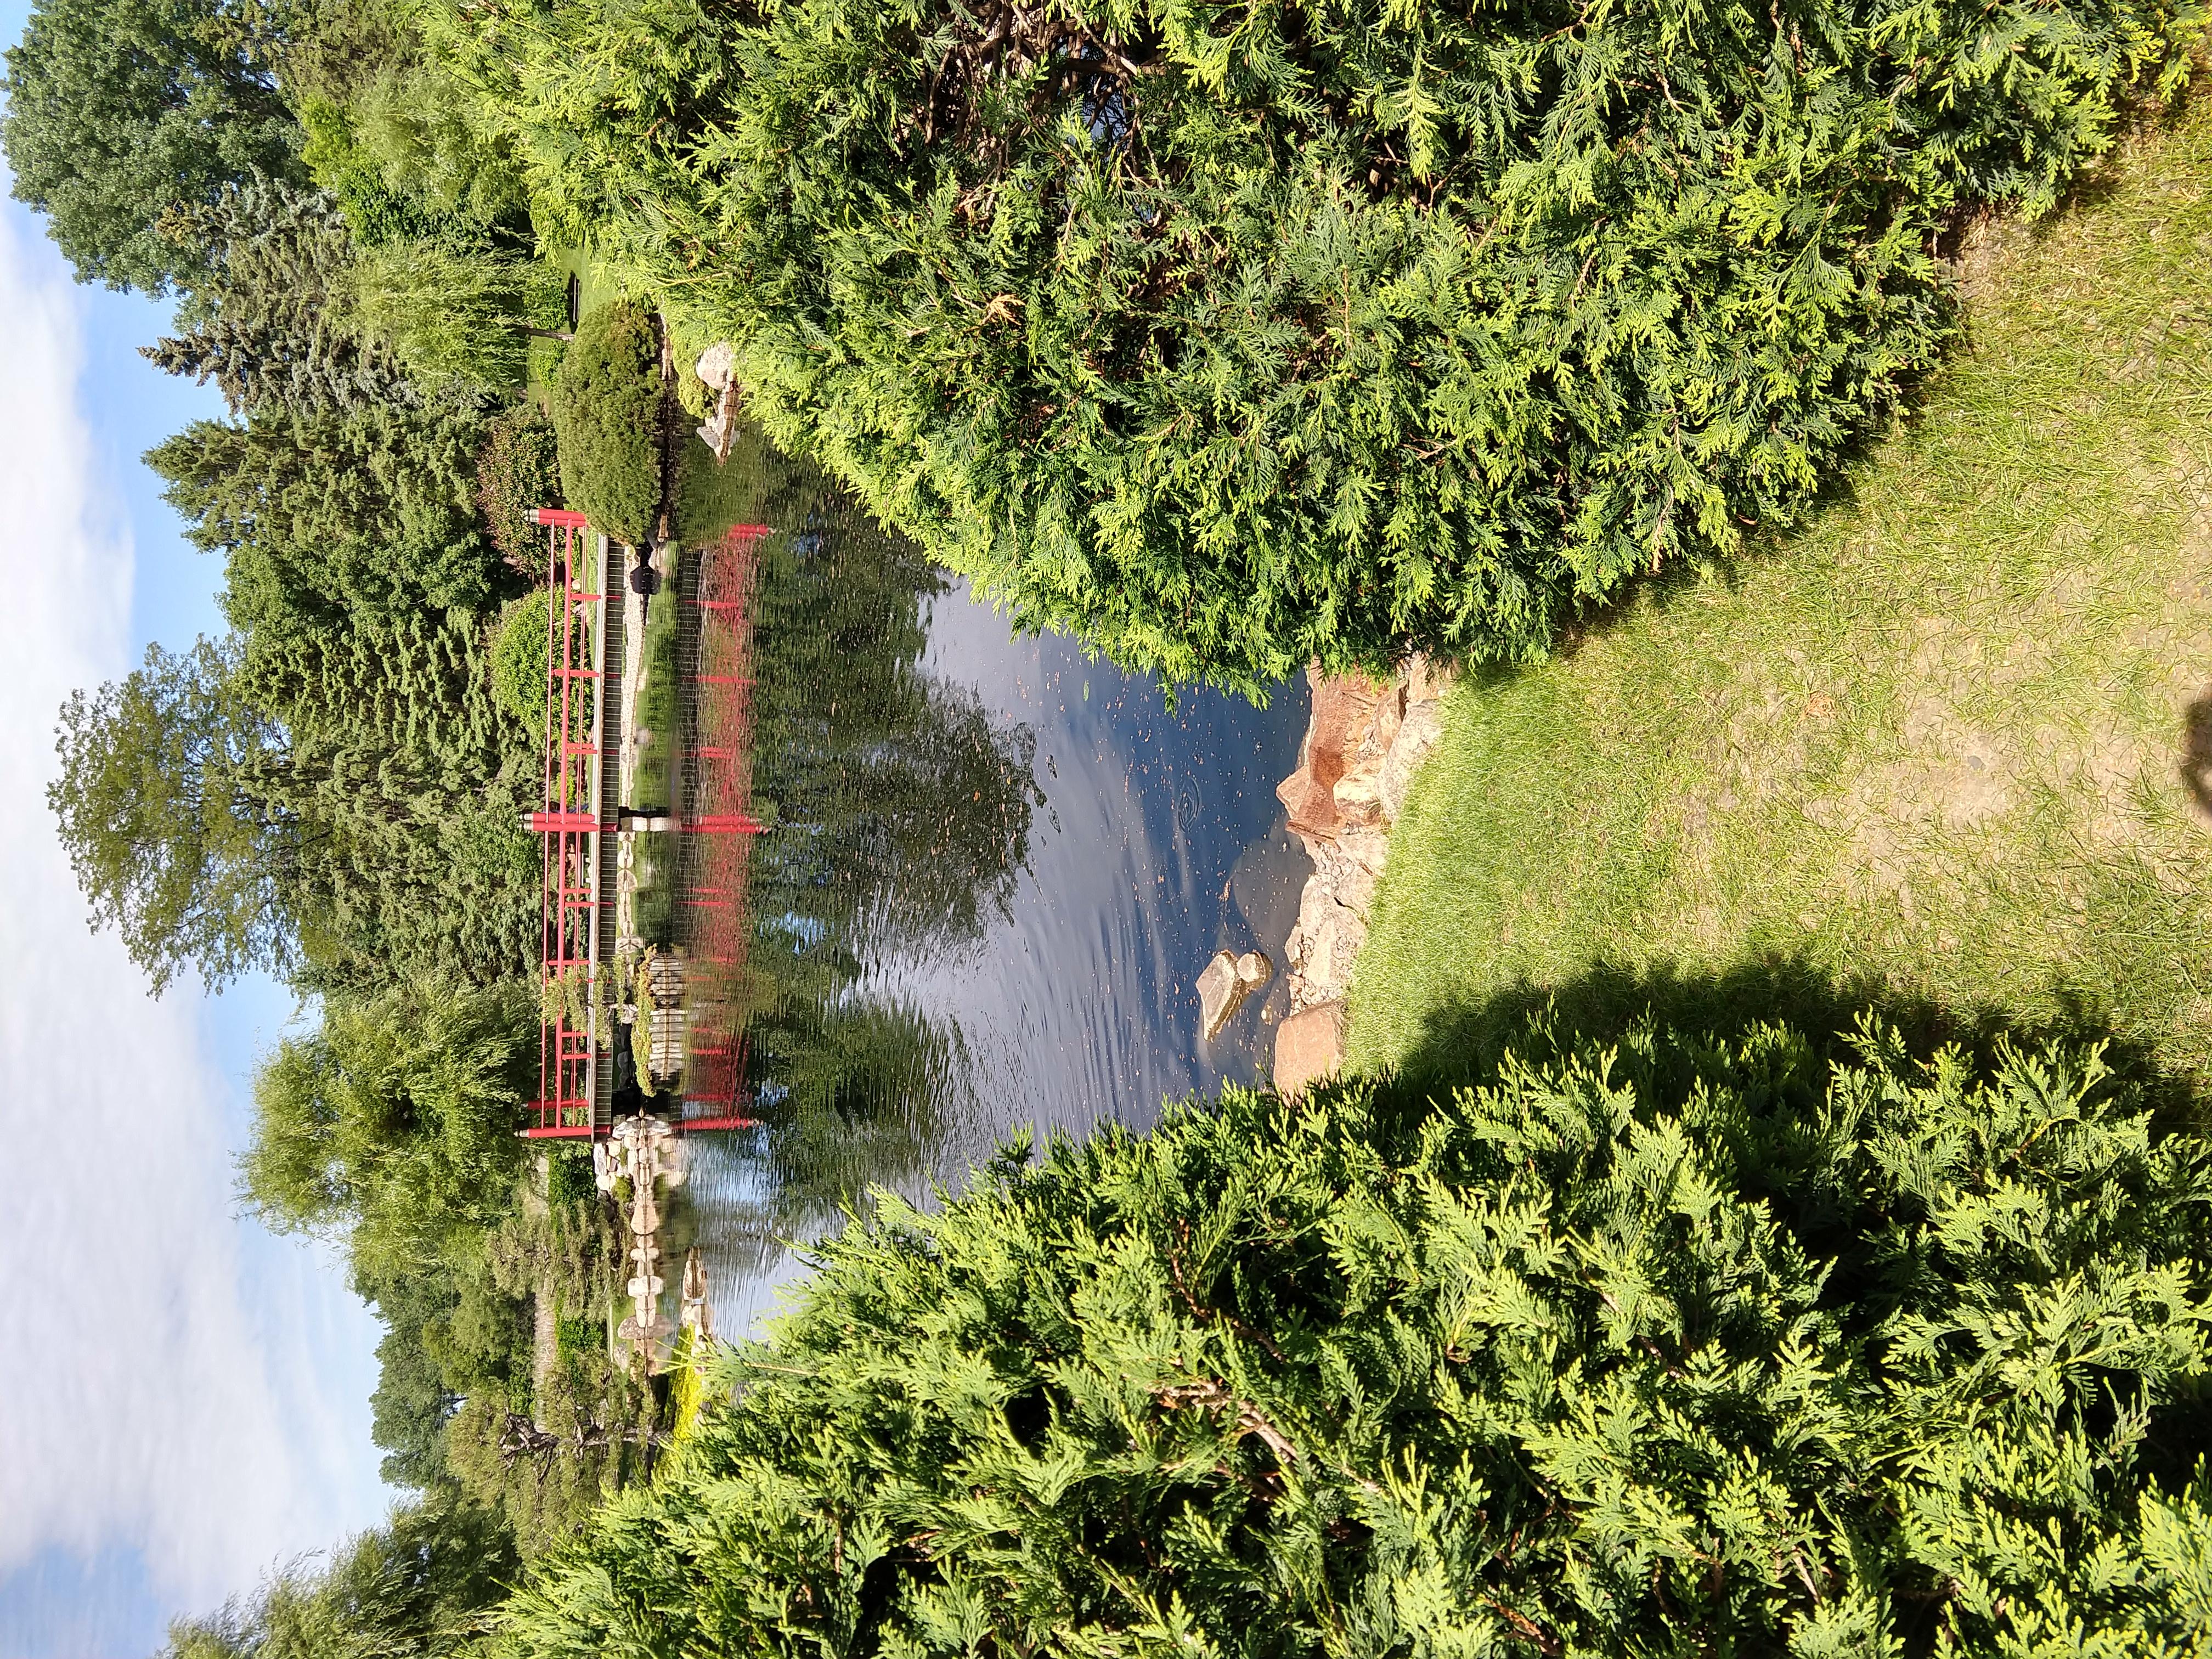 File:Normandale Community College 13 - Japanese garden.jpg